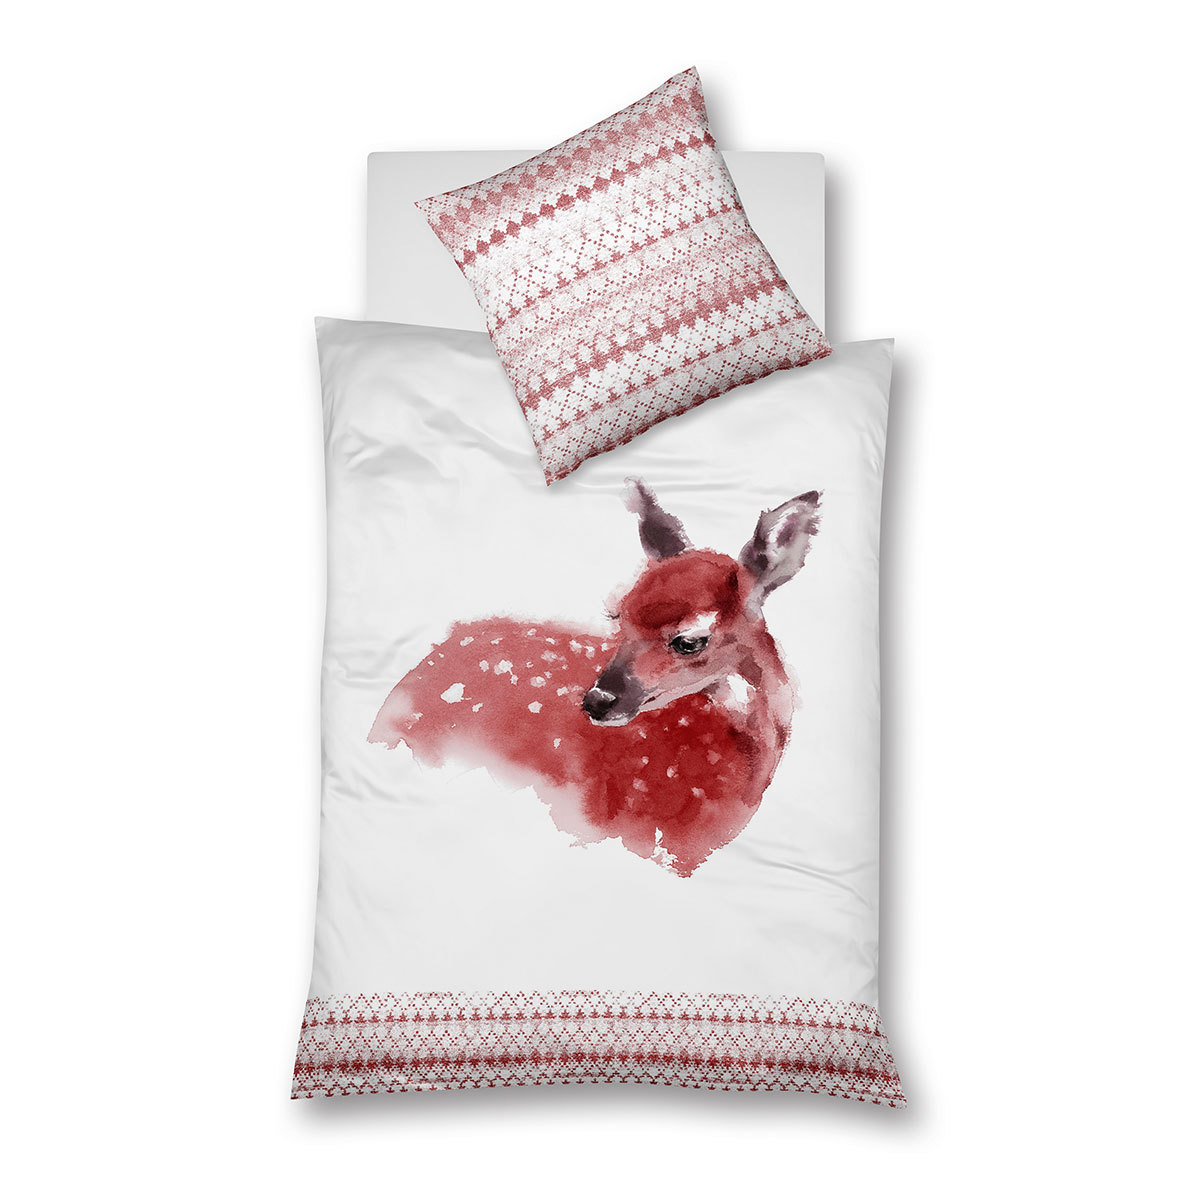 Traumschlaf Feinbiber Bettwäsche Reh berry